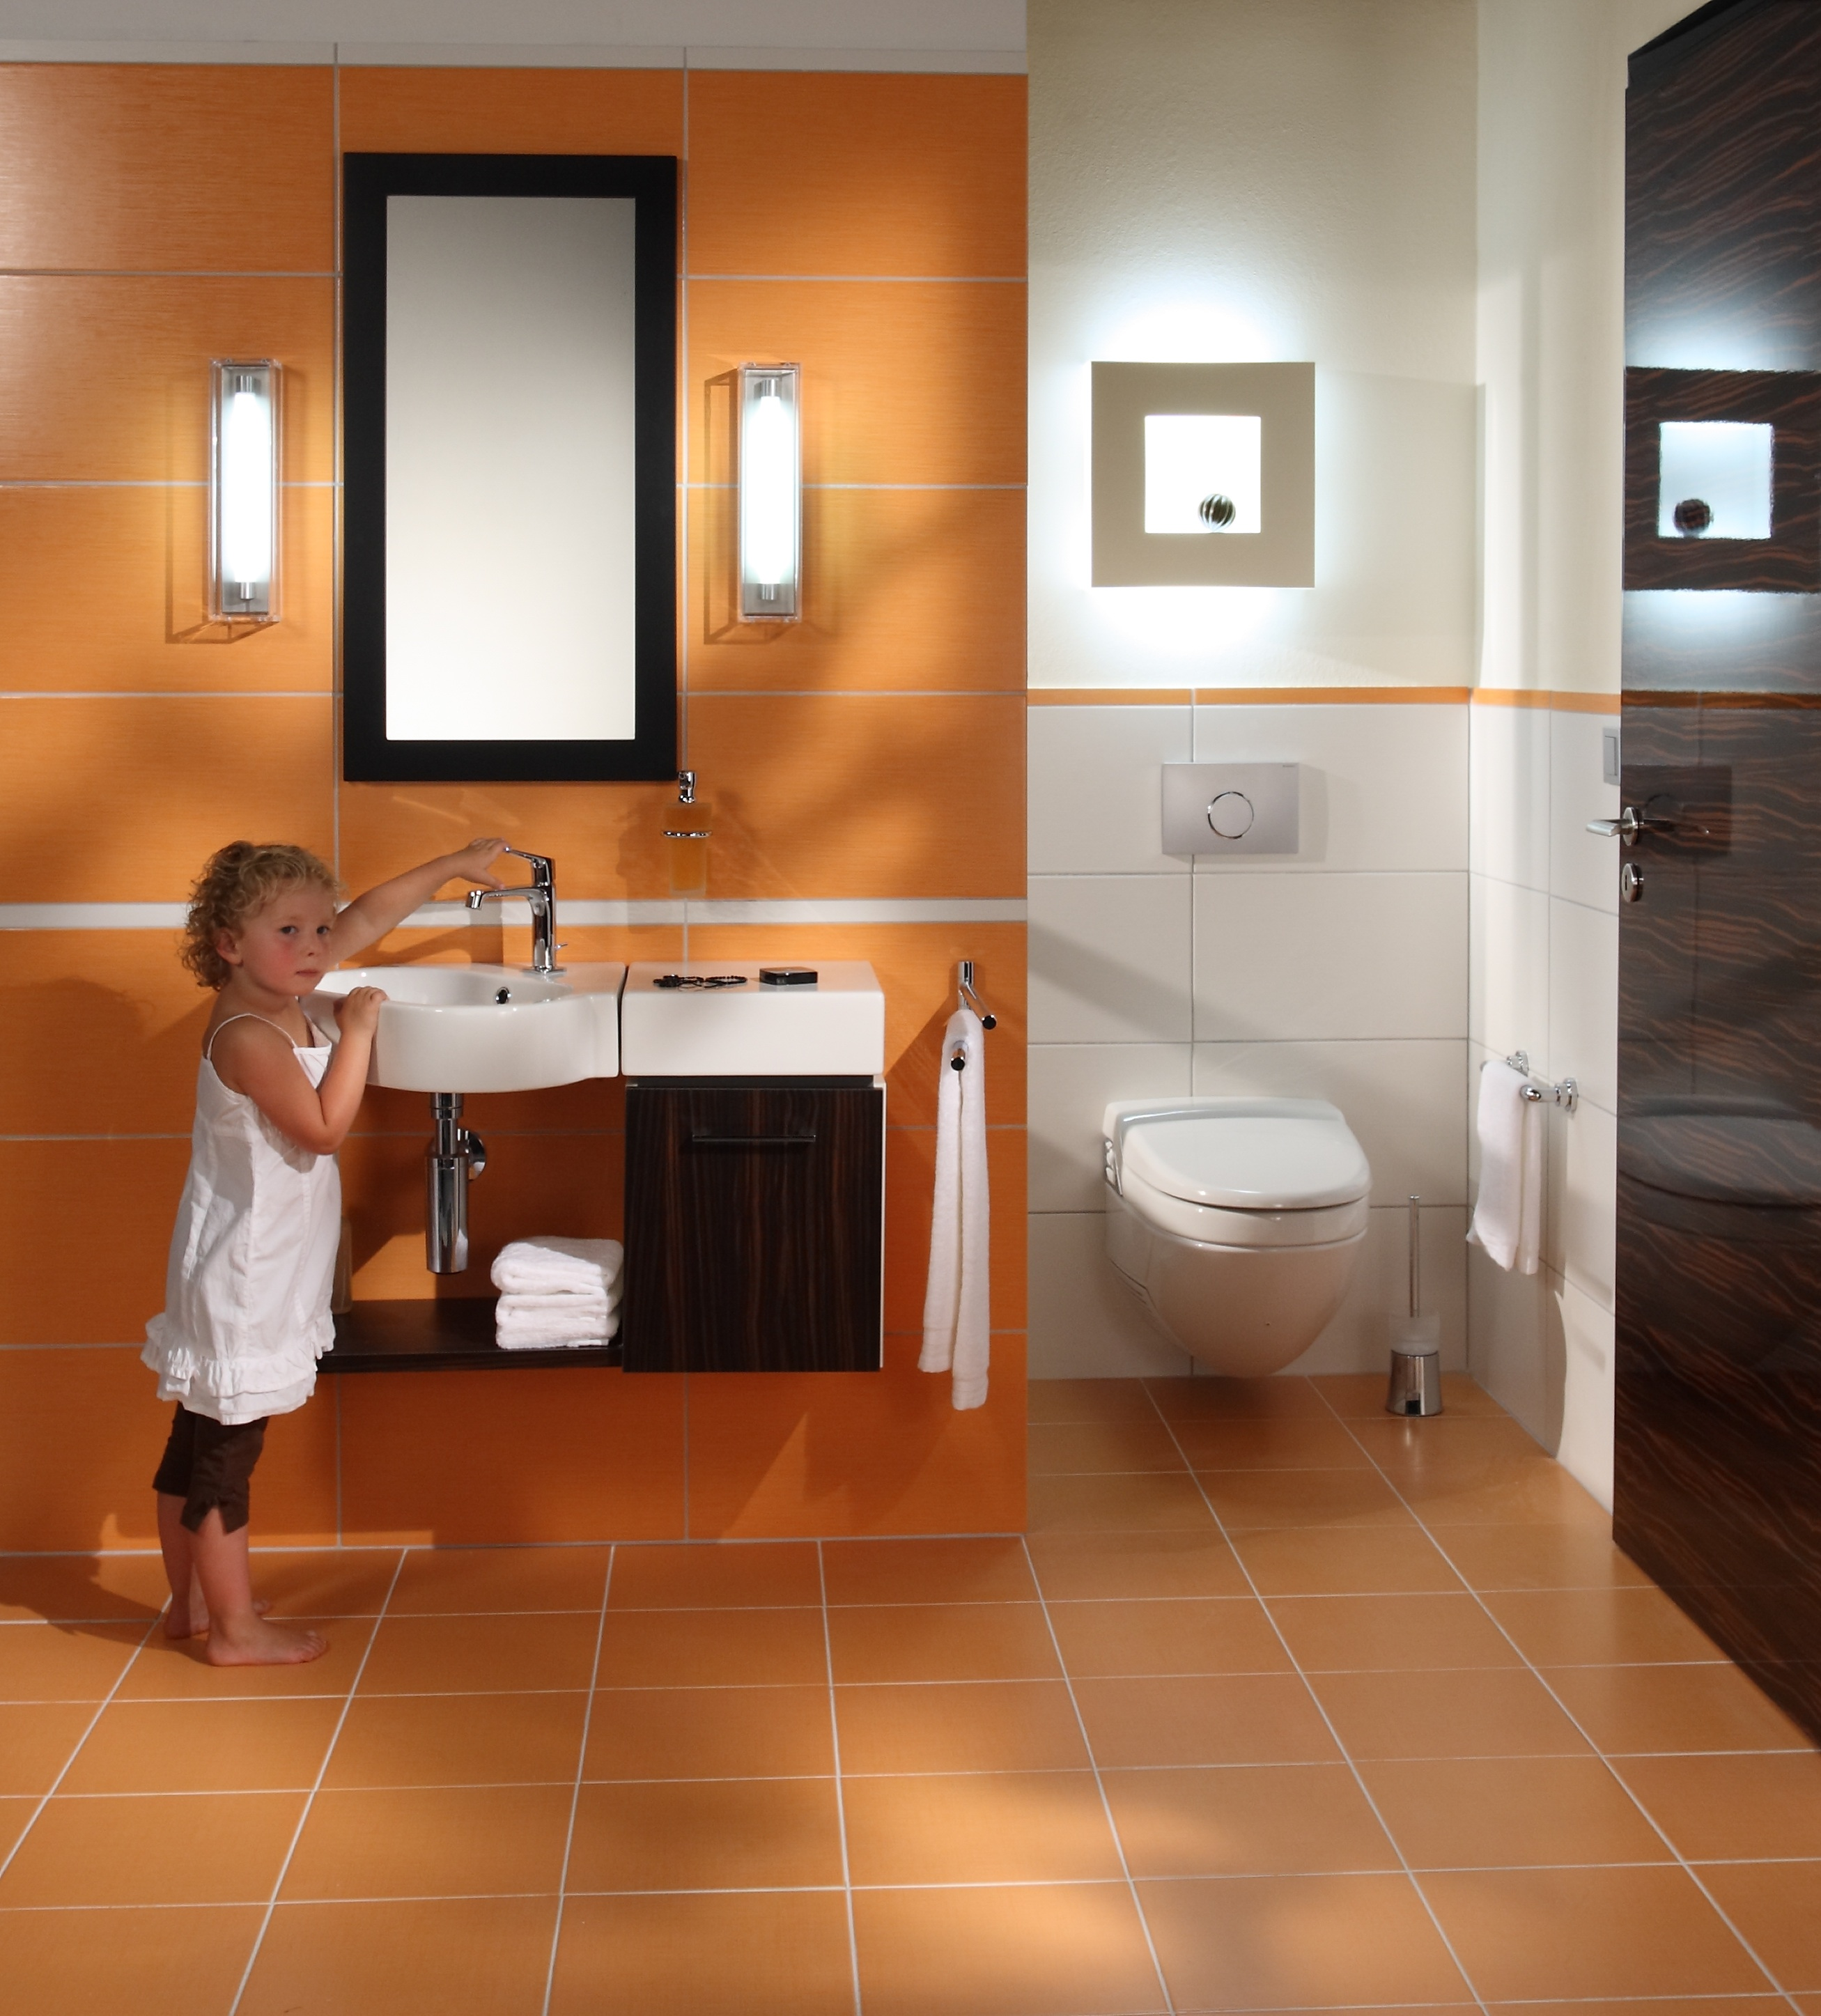 Badezimmer richtig beleuchten: licht.de